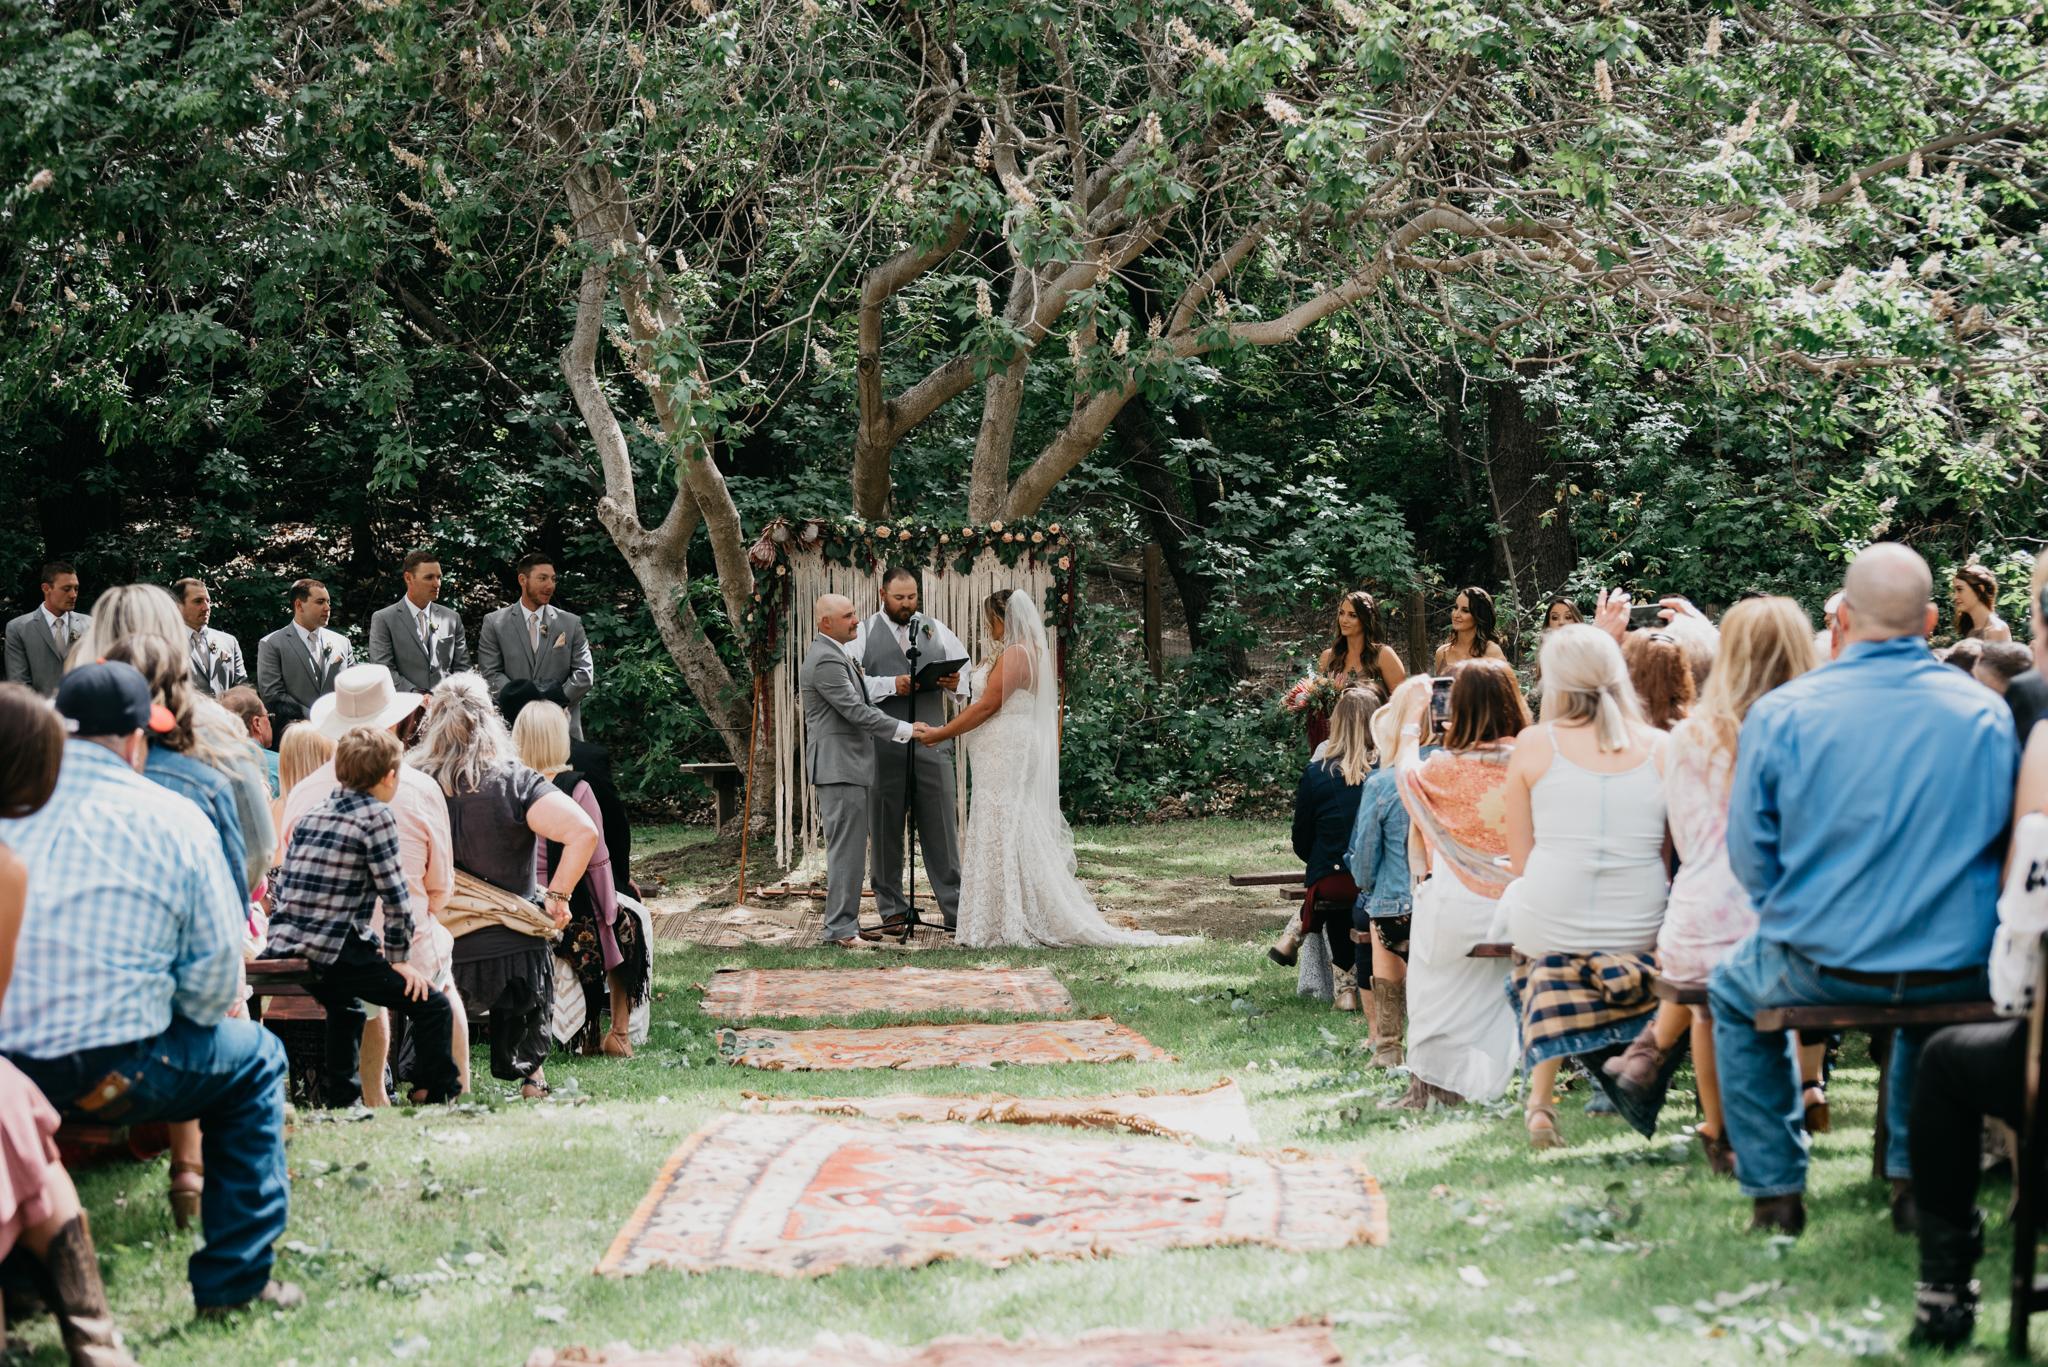 carmel valley bohemian wedding Big sur California Coast adventerous wedding elopment intimate wedding photographer